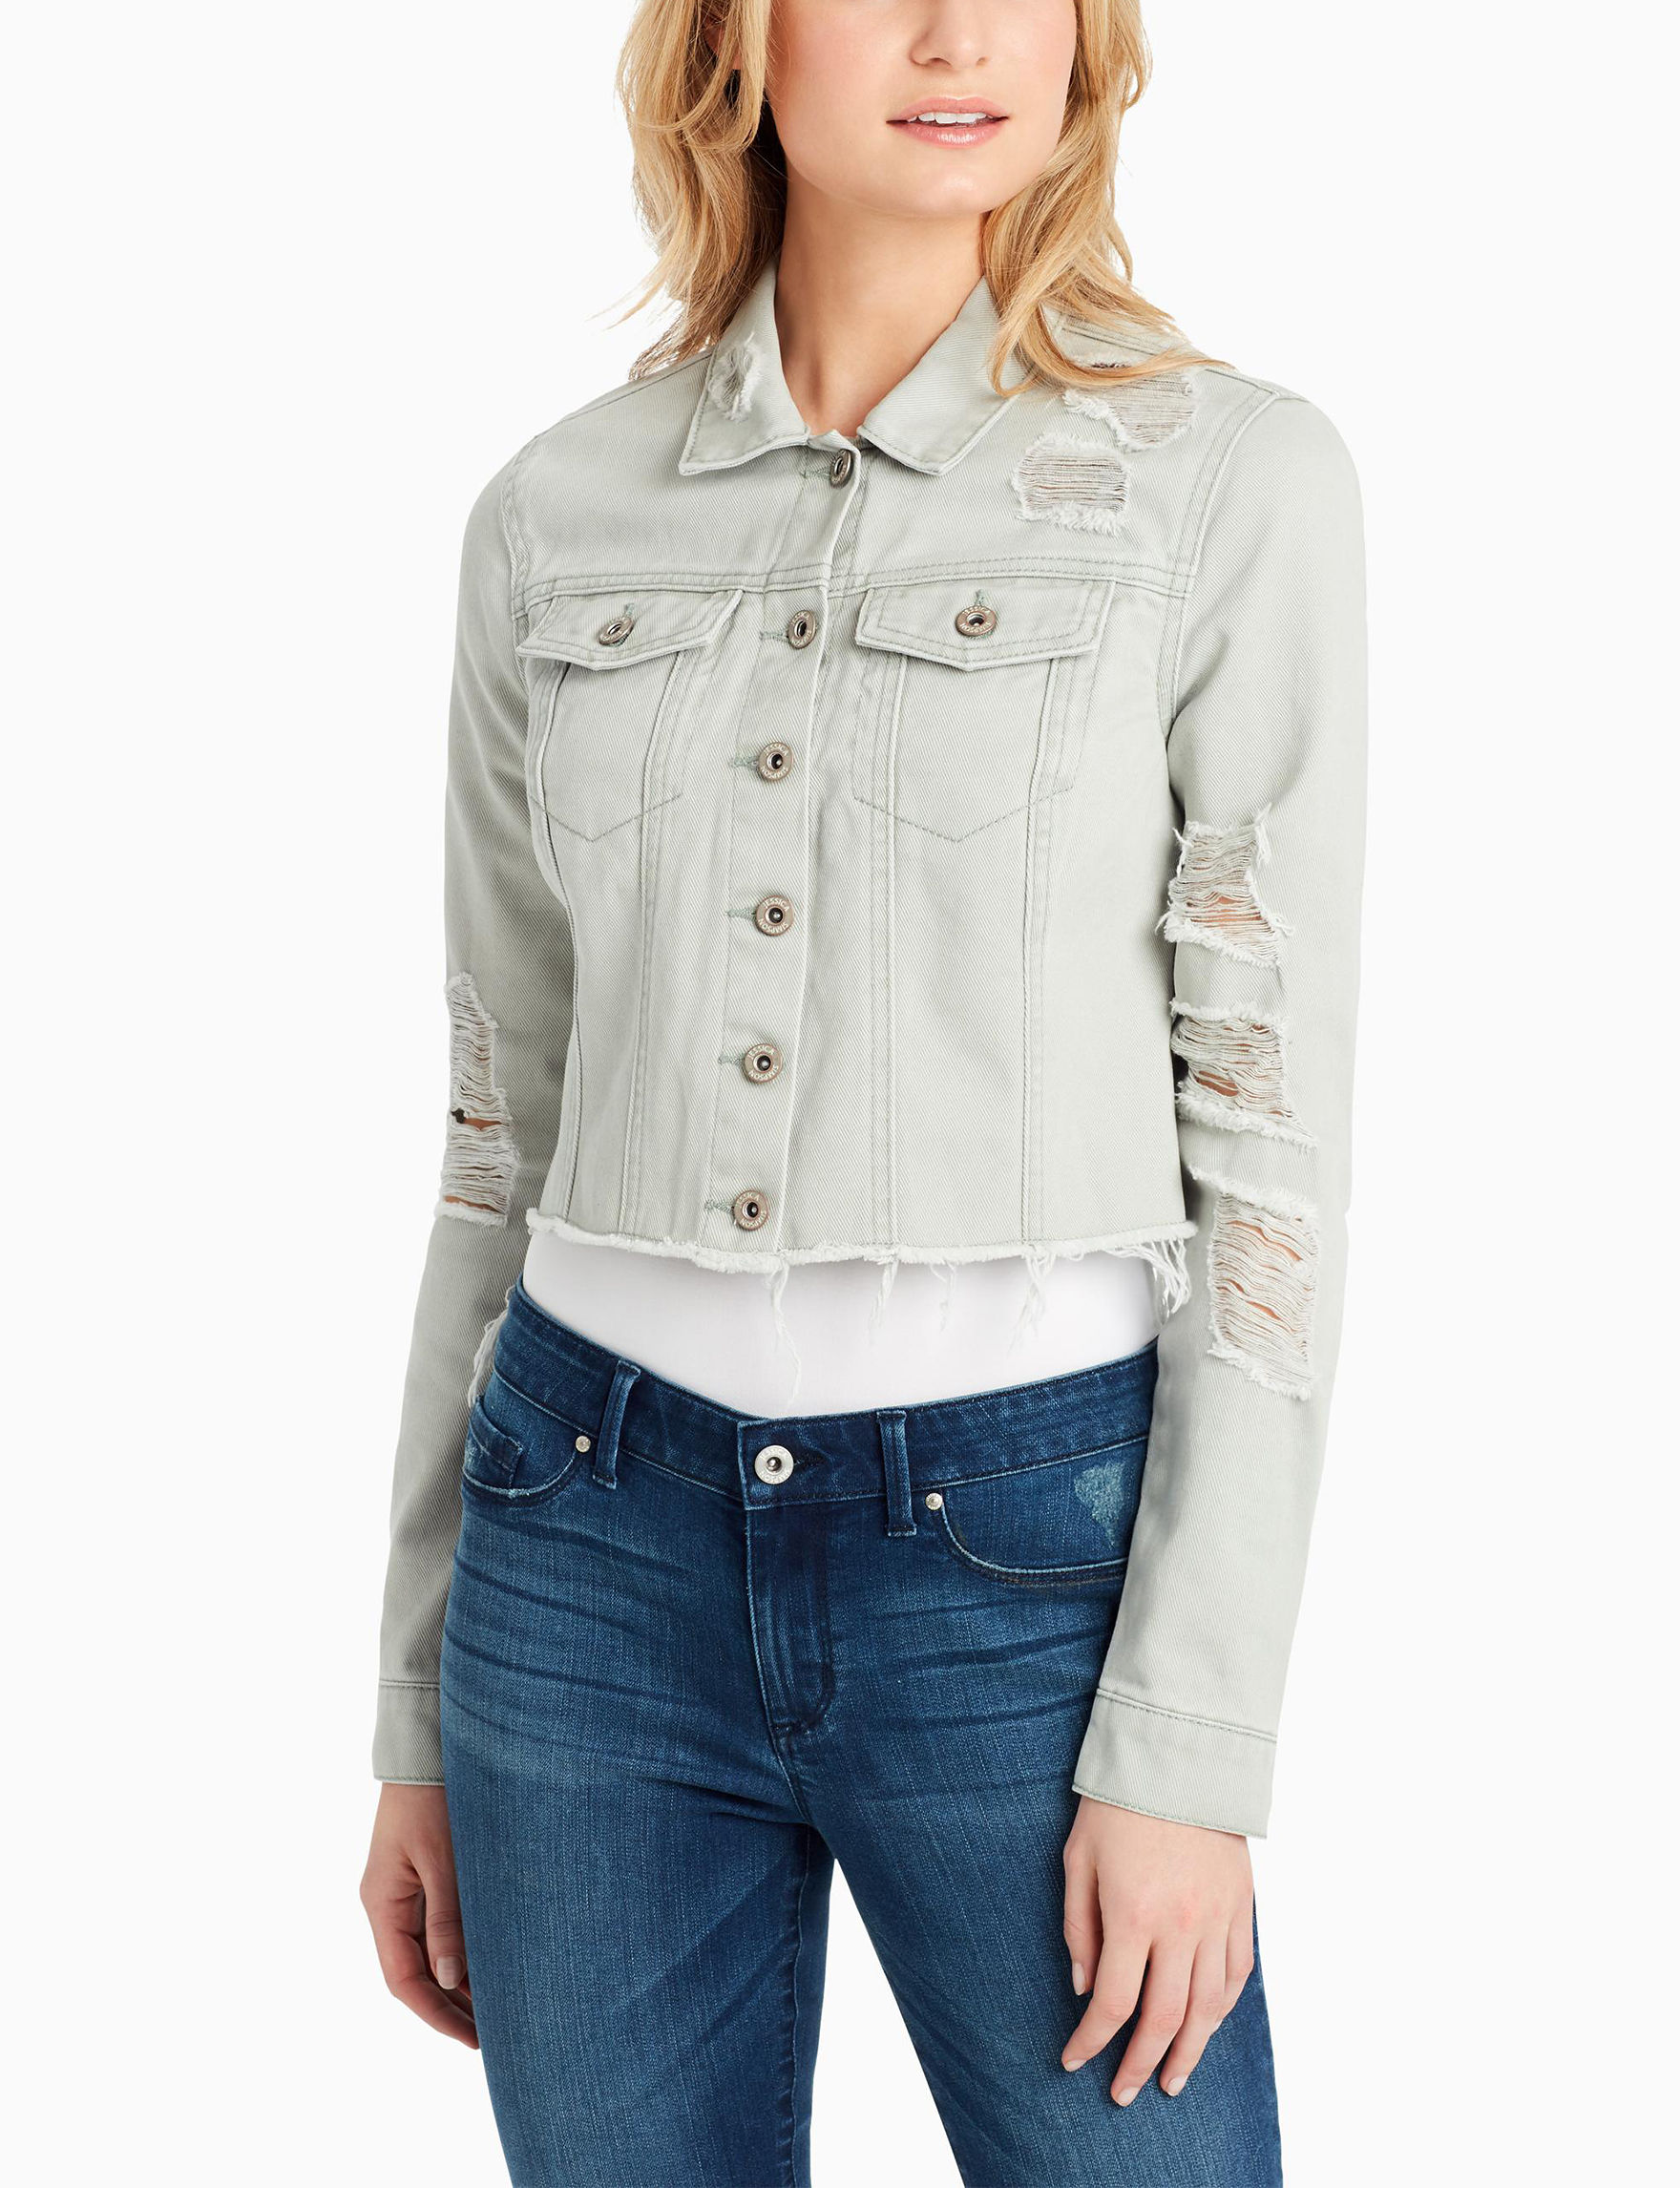 Jessica Simpson Light Green Denim Jackets